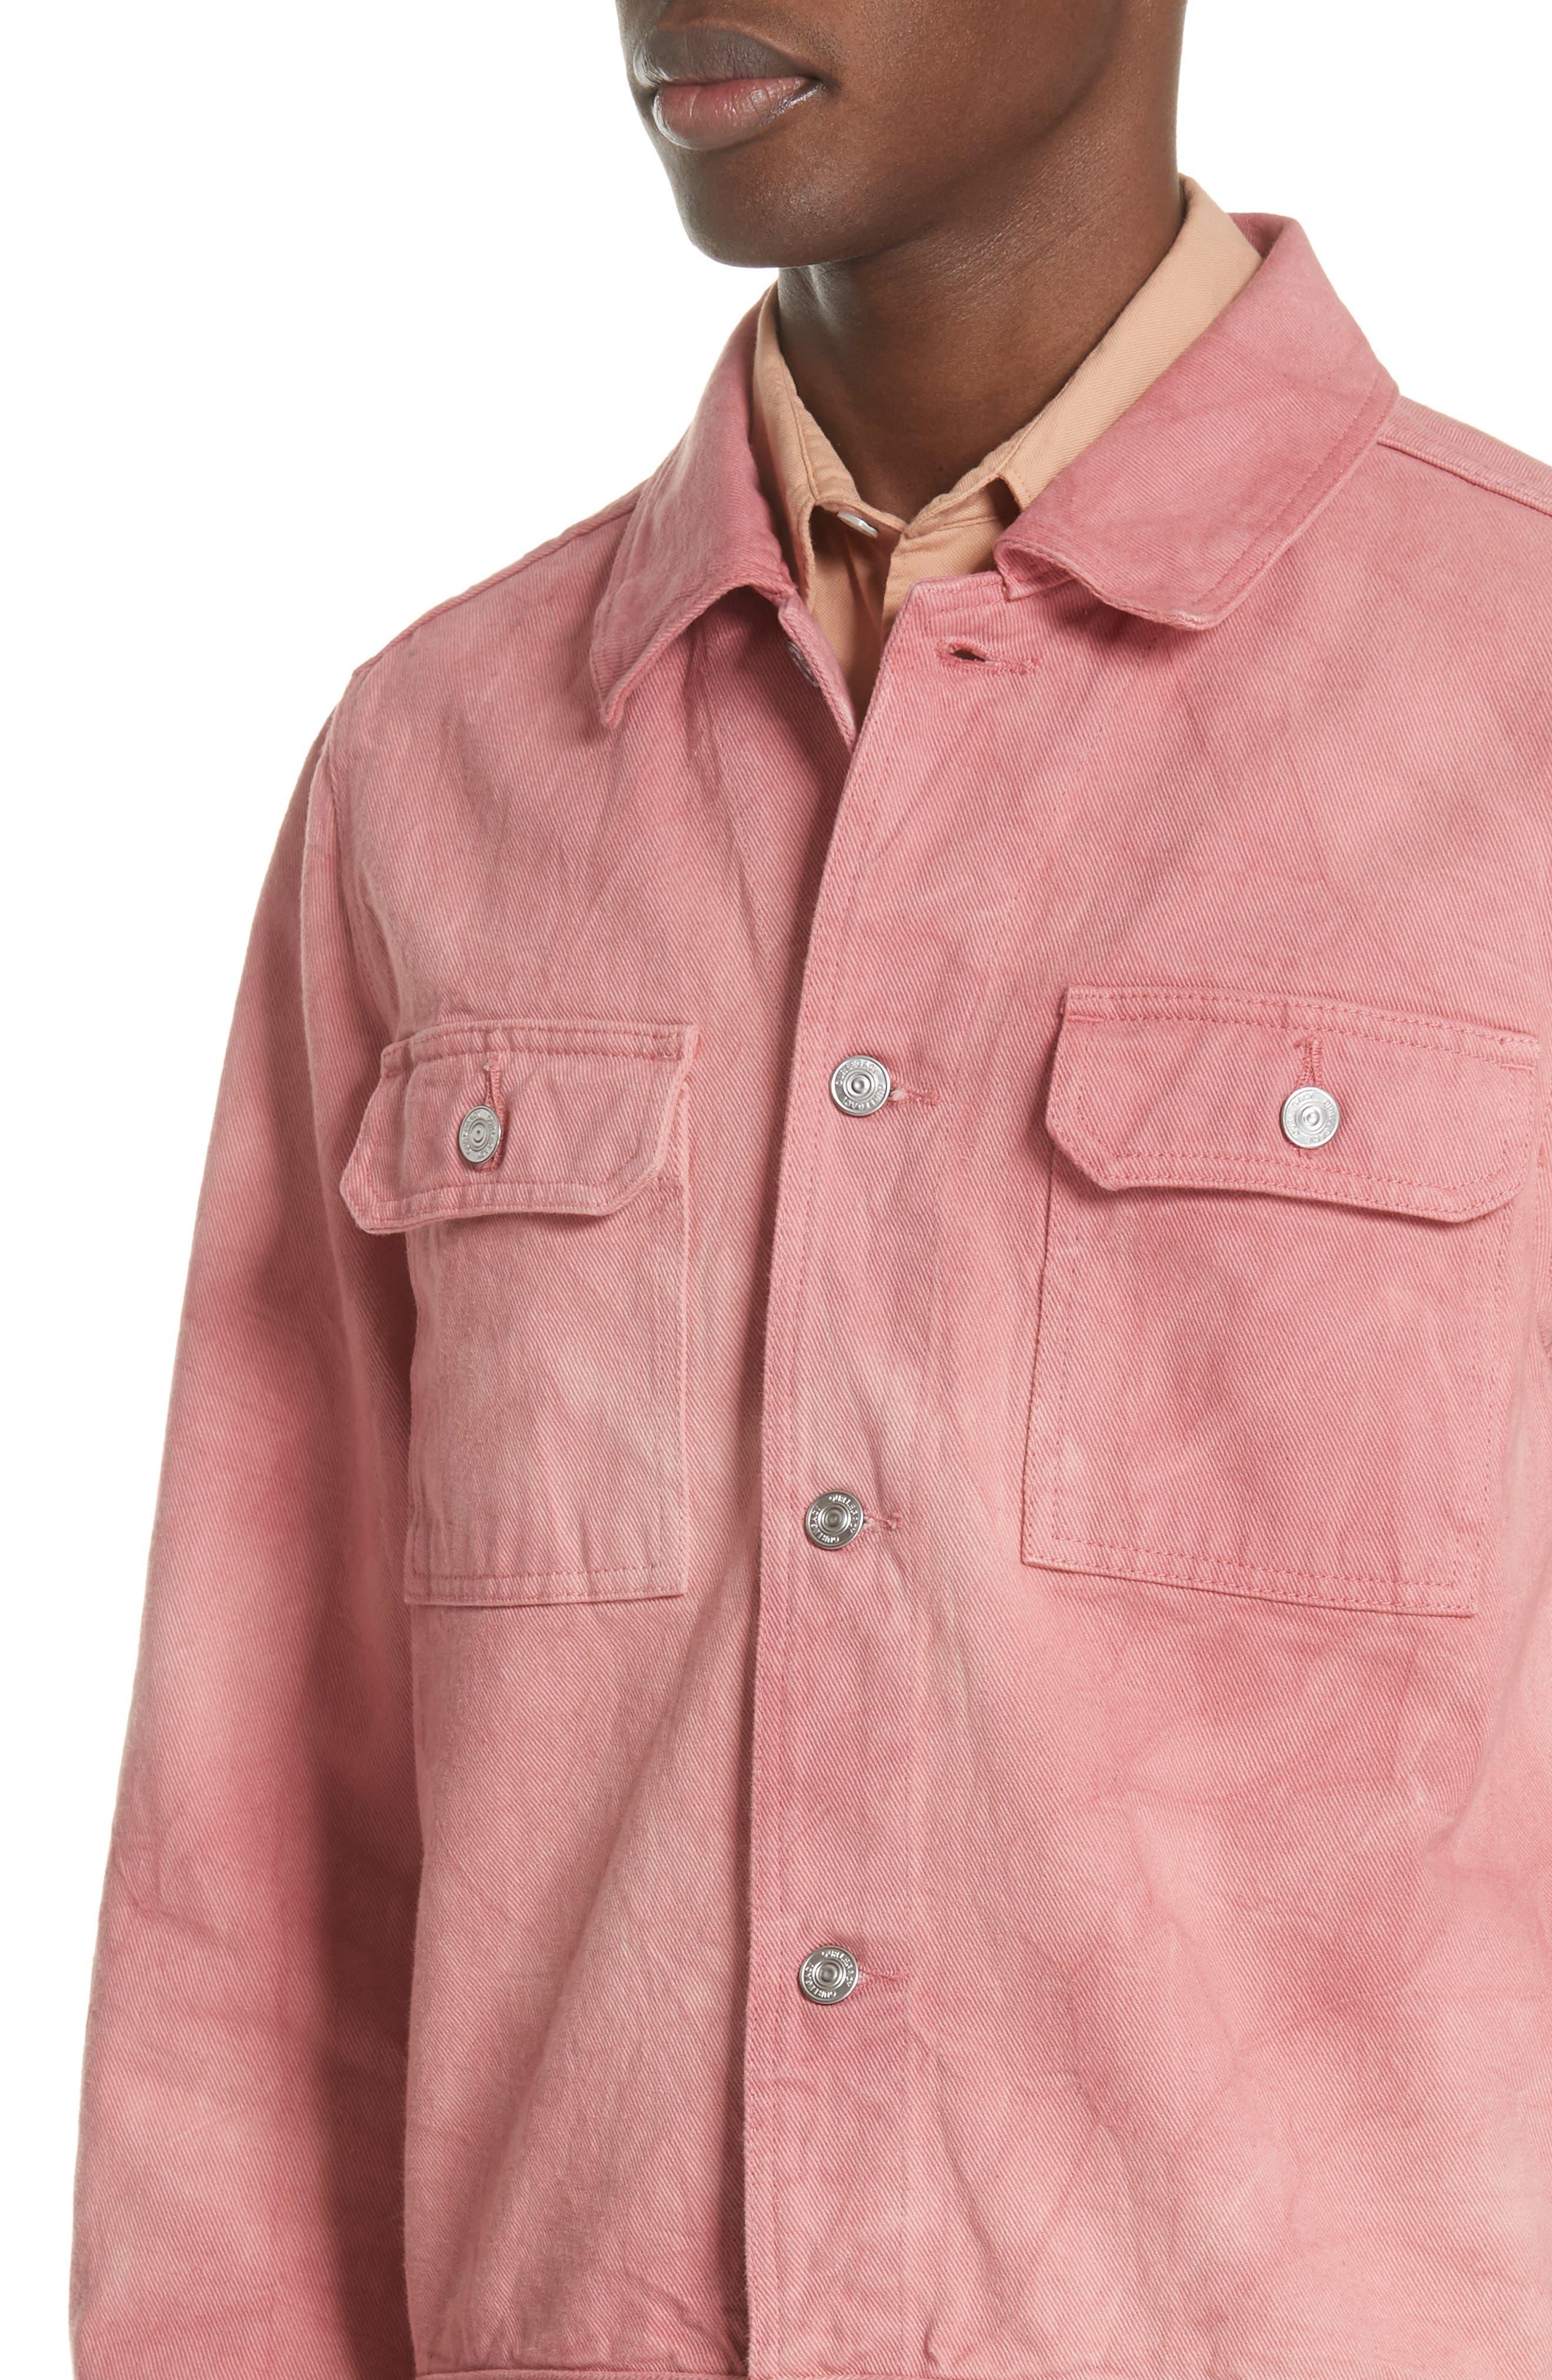 Dye Jacket,                             Alternate thumbnail 4, color,                             Pink